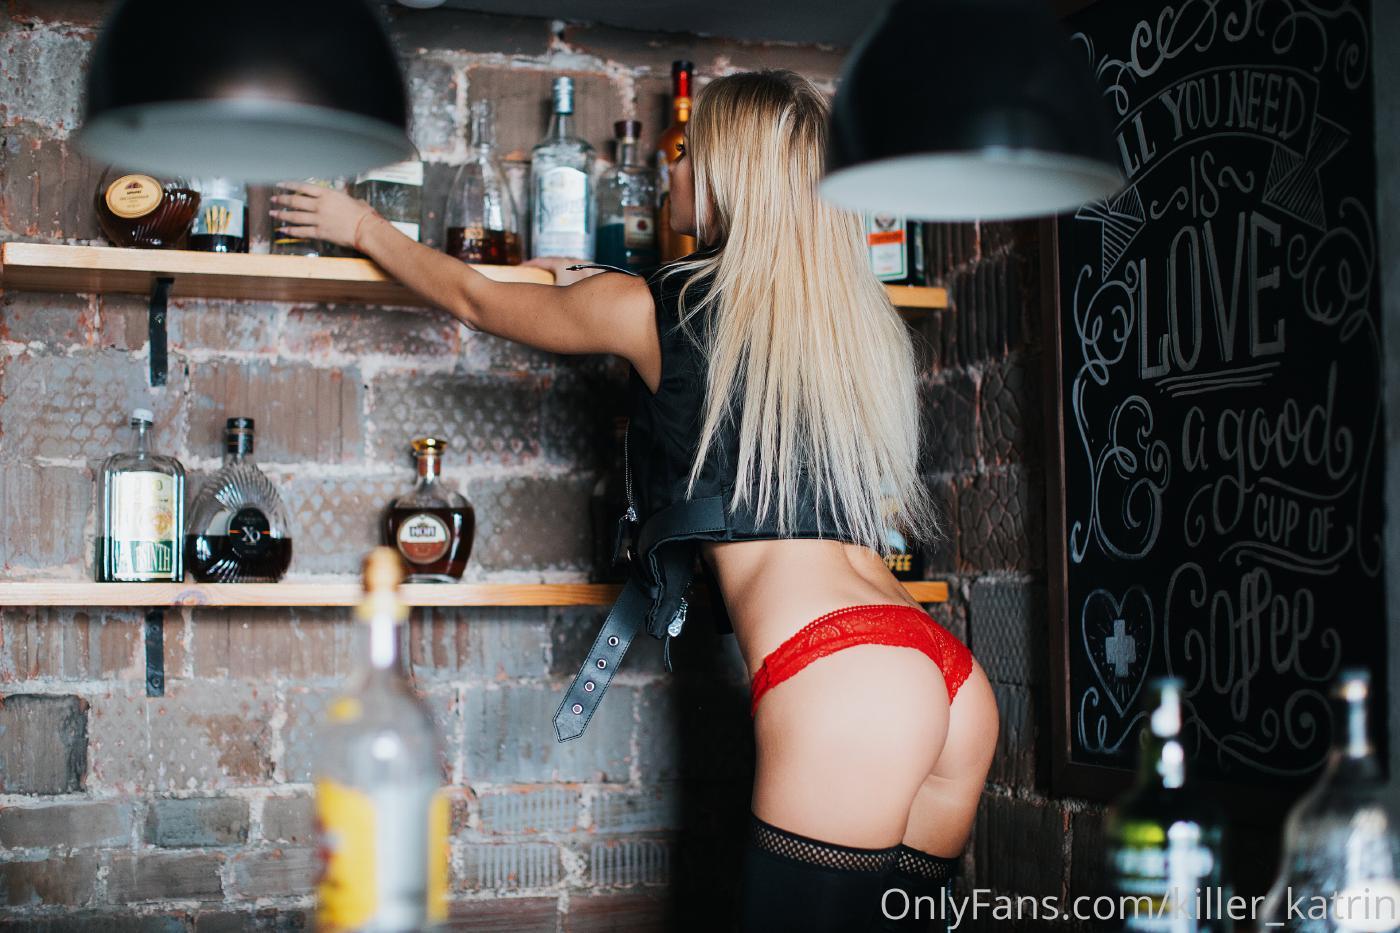 Killer Katrin Bar Striptease Onlyfans Set Leaked 0005